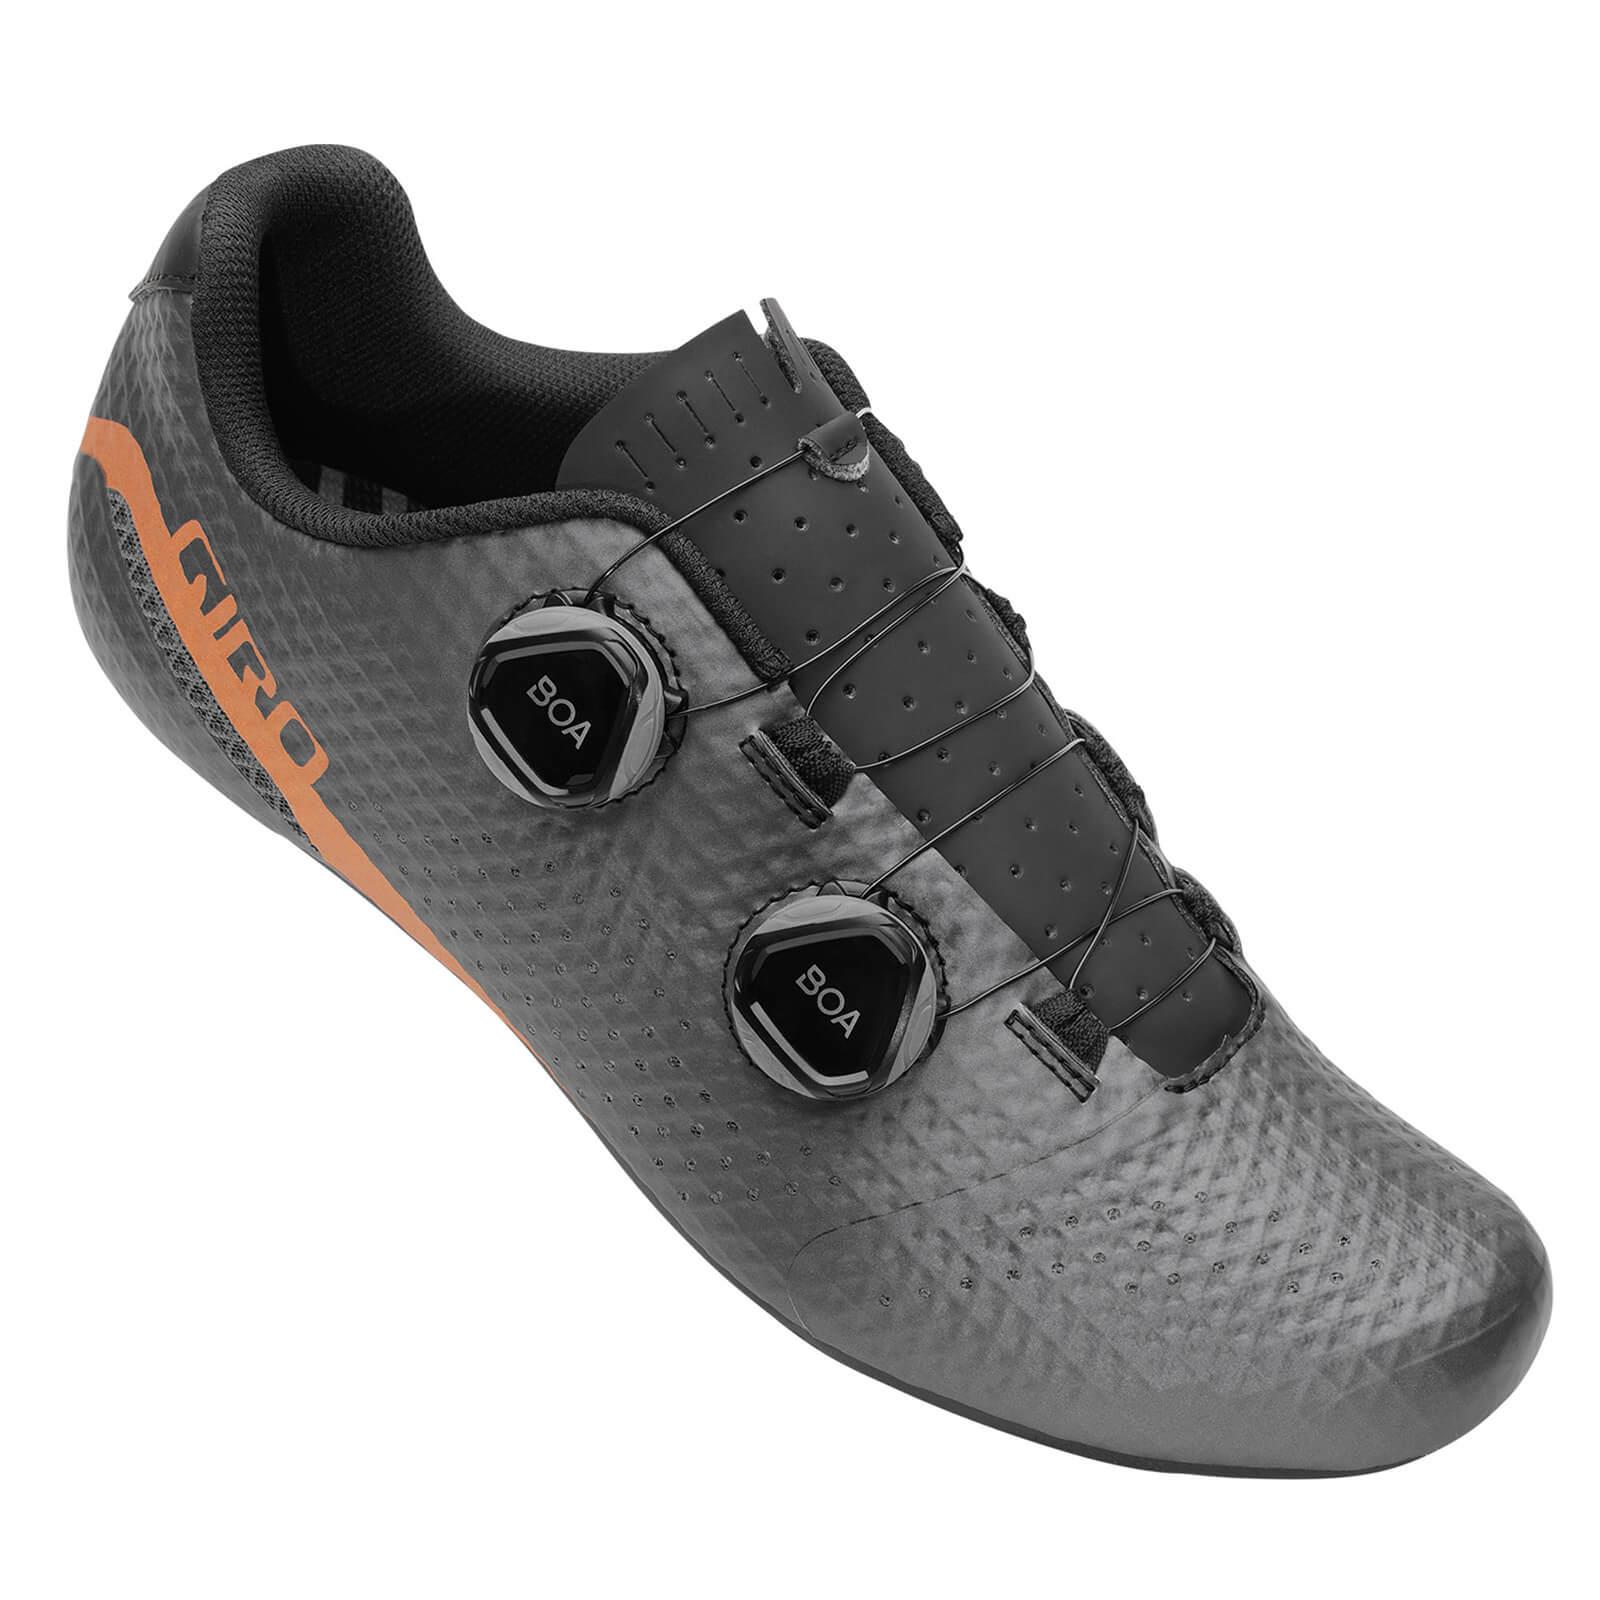 Giro Regime Road Shoe - EU 48 - Black/Copper